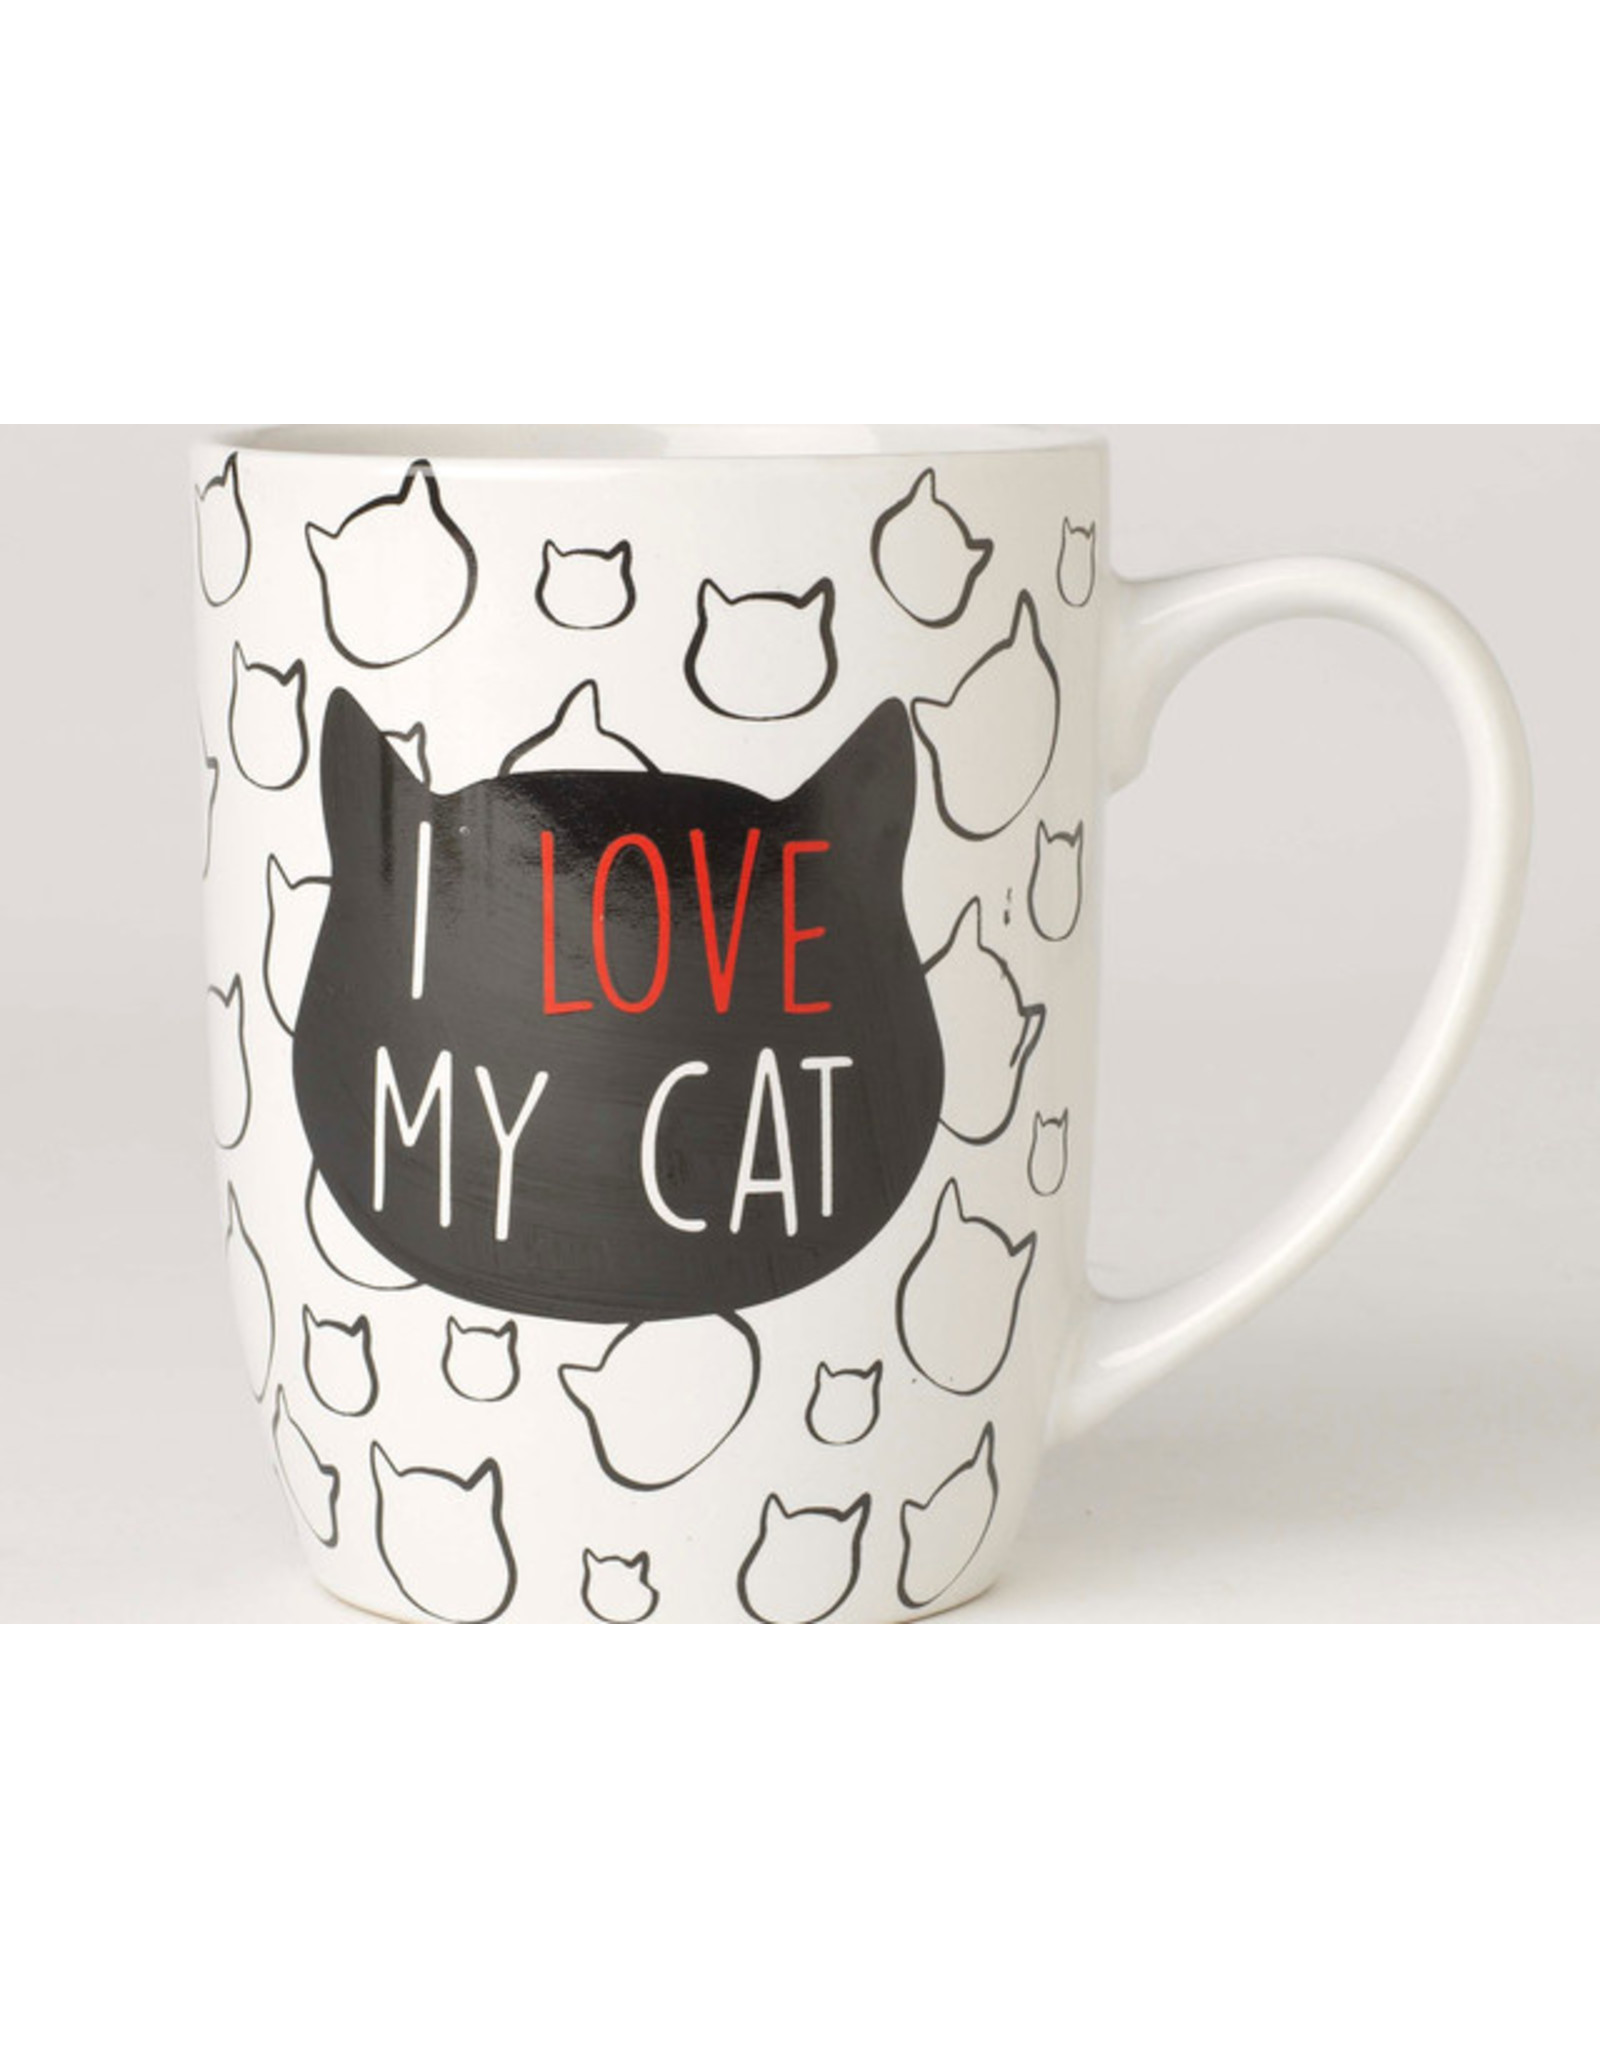 Petrageous I LOVE MY CAT Jumbo 28oz Mug